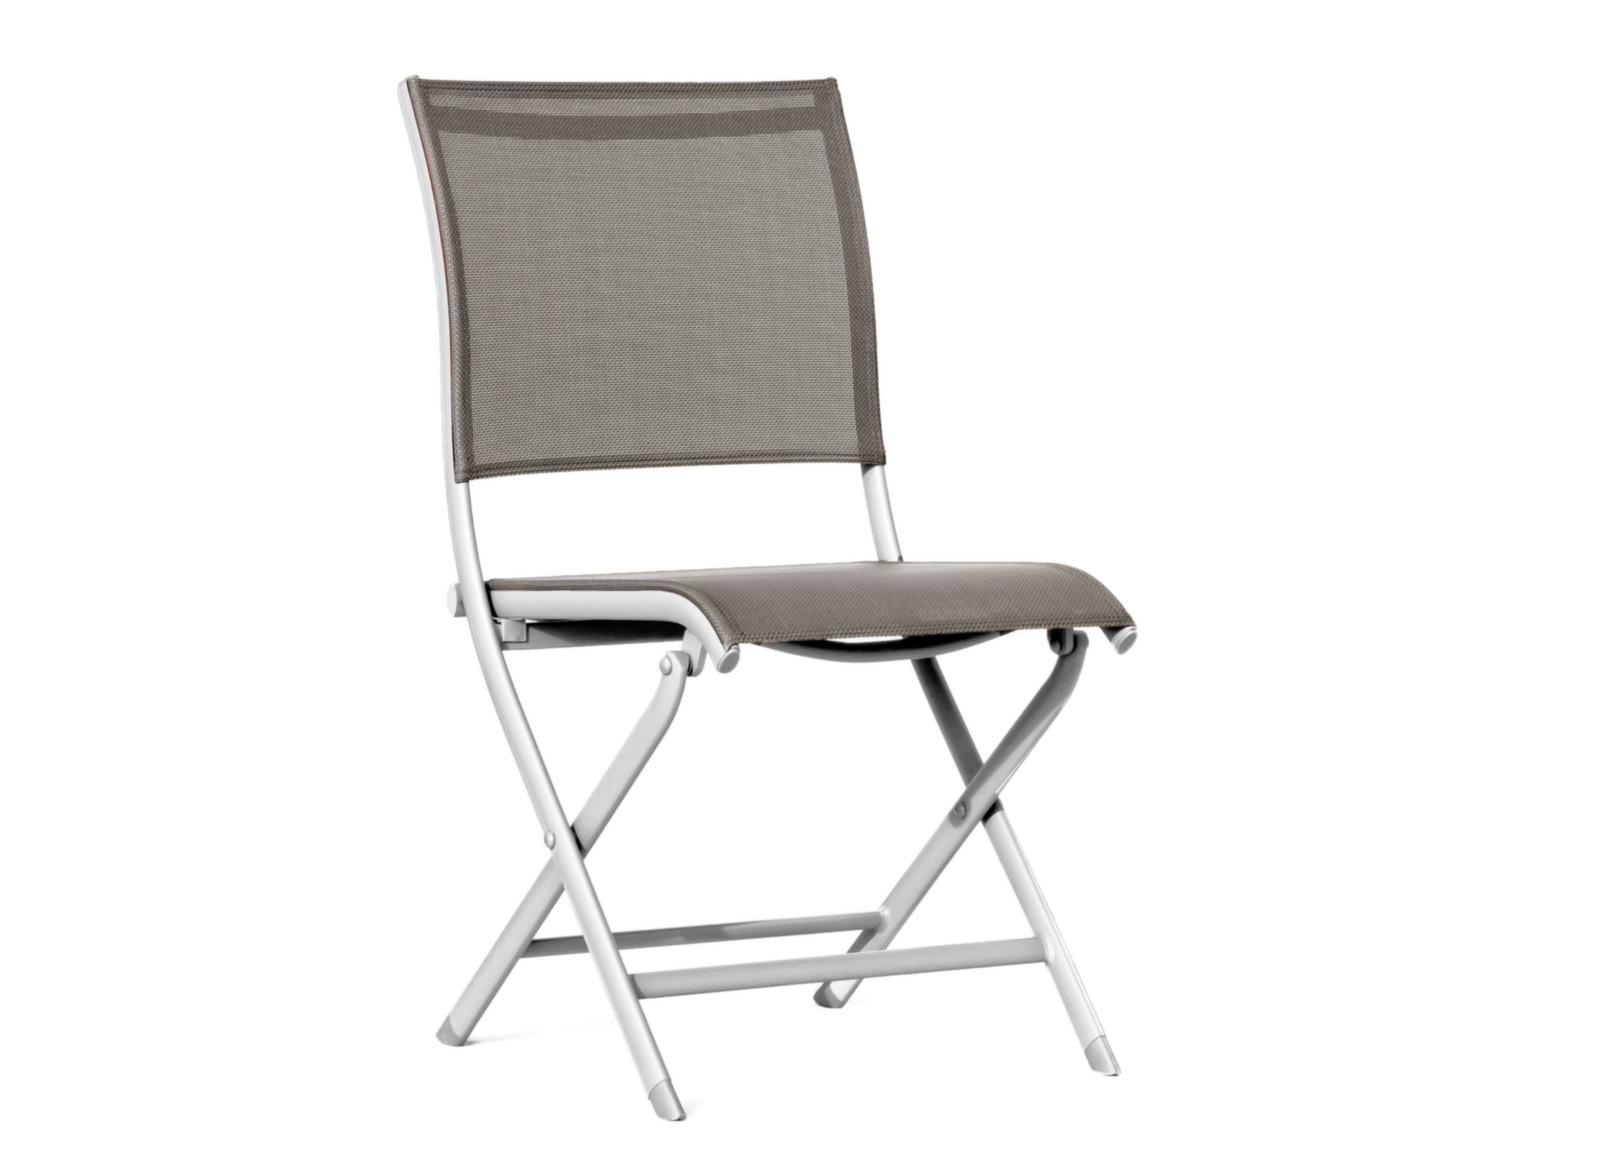 Chaise de jardin pliante blanche l gance oc o - Chaise pliante salon ...